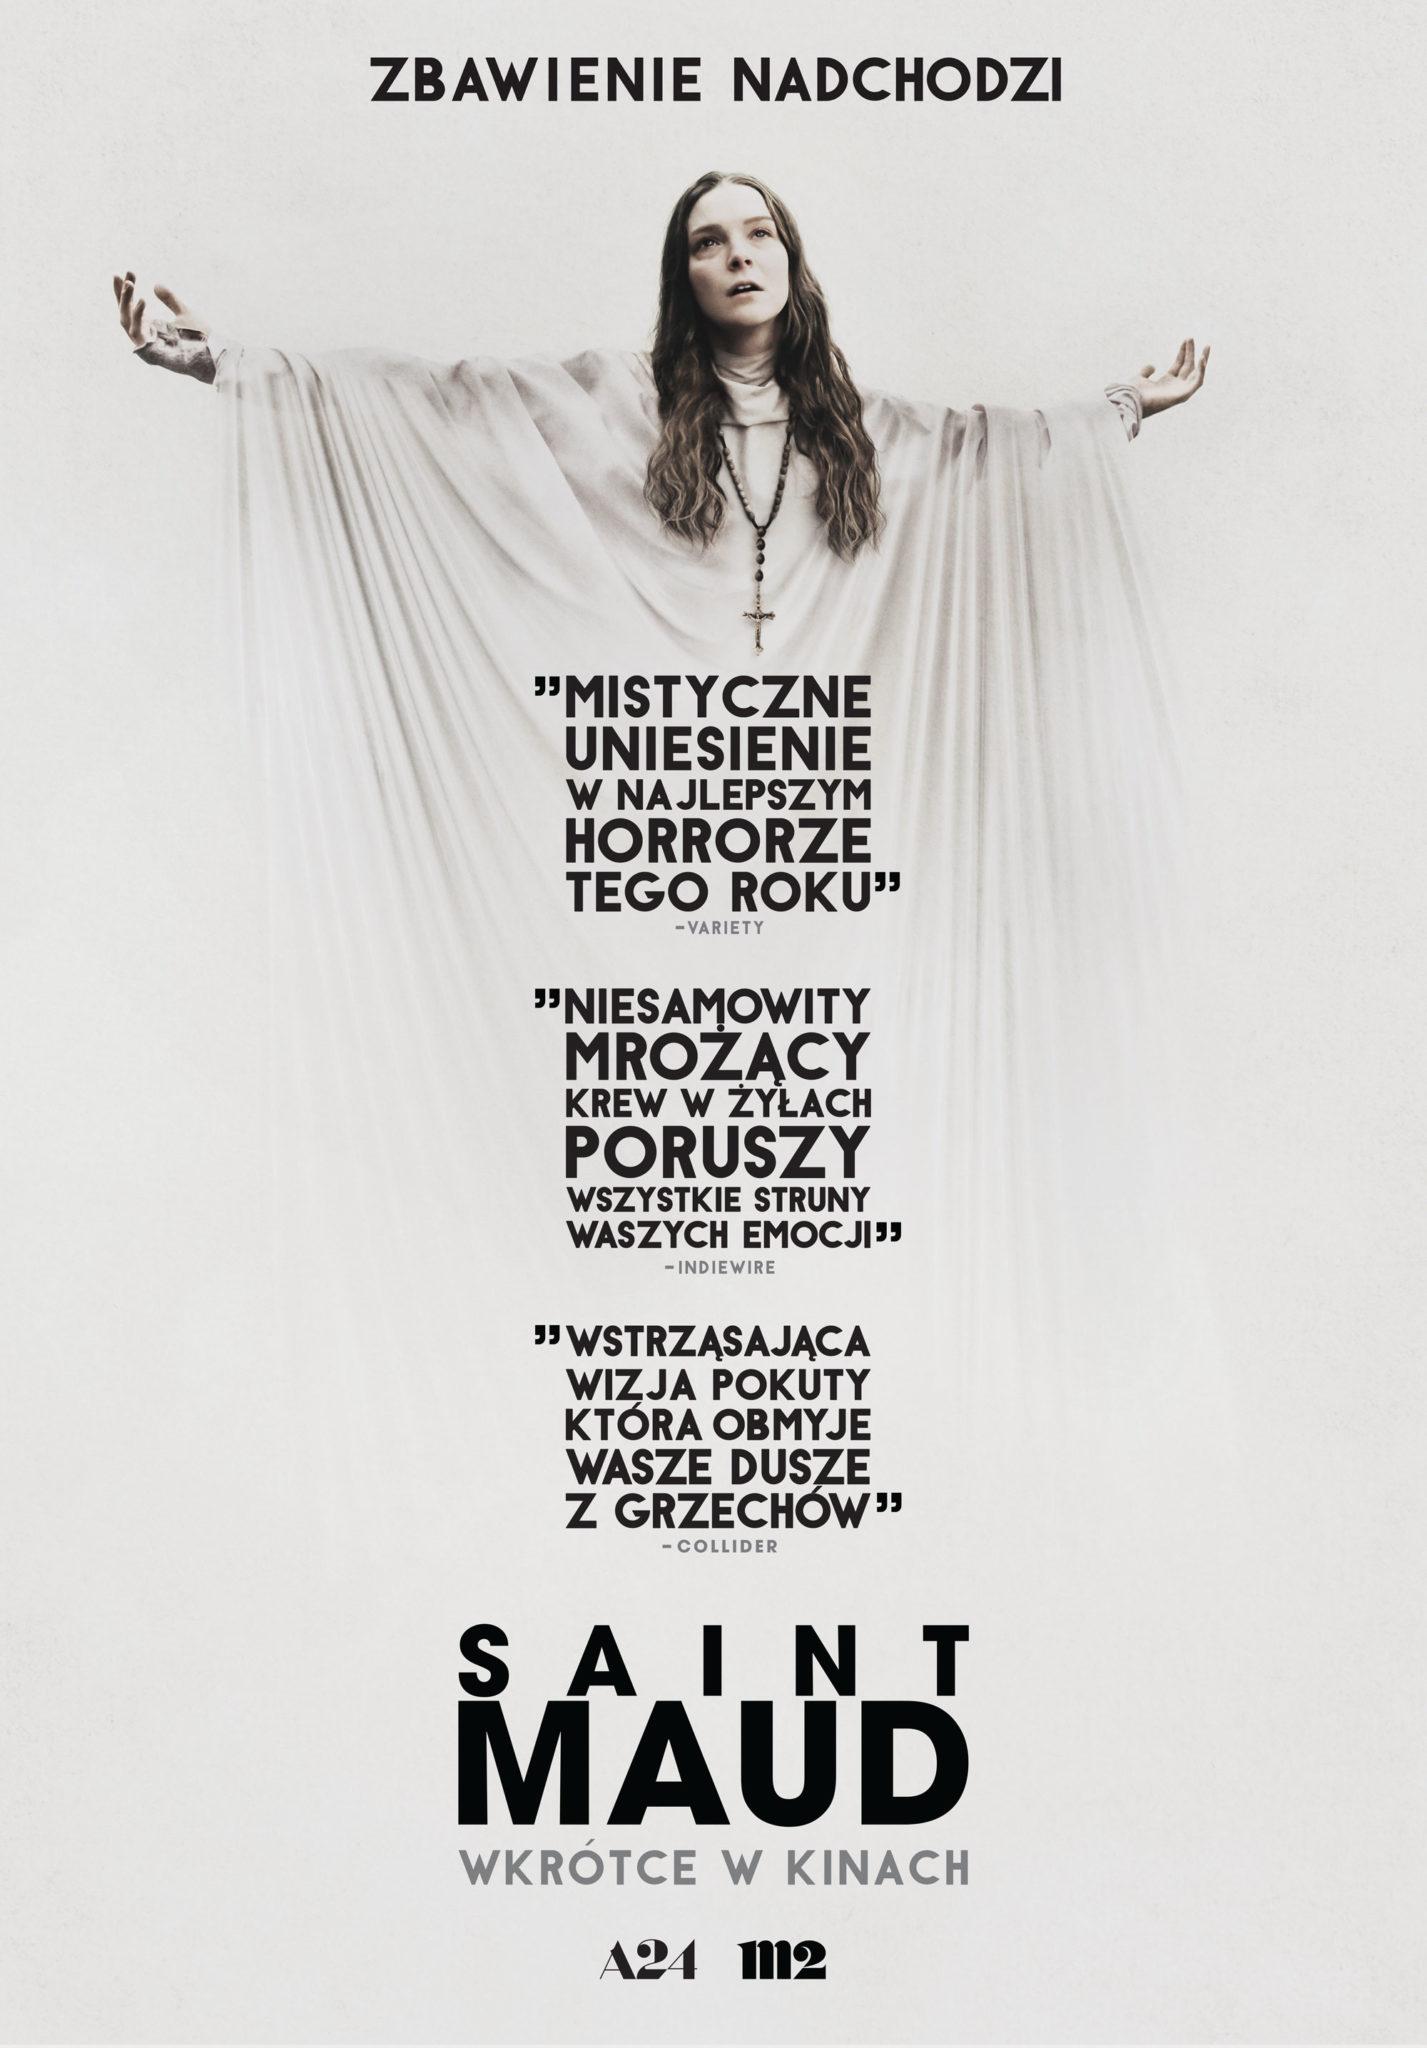 Saint maud plakat